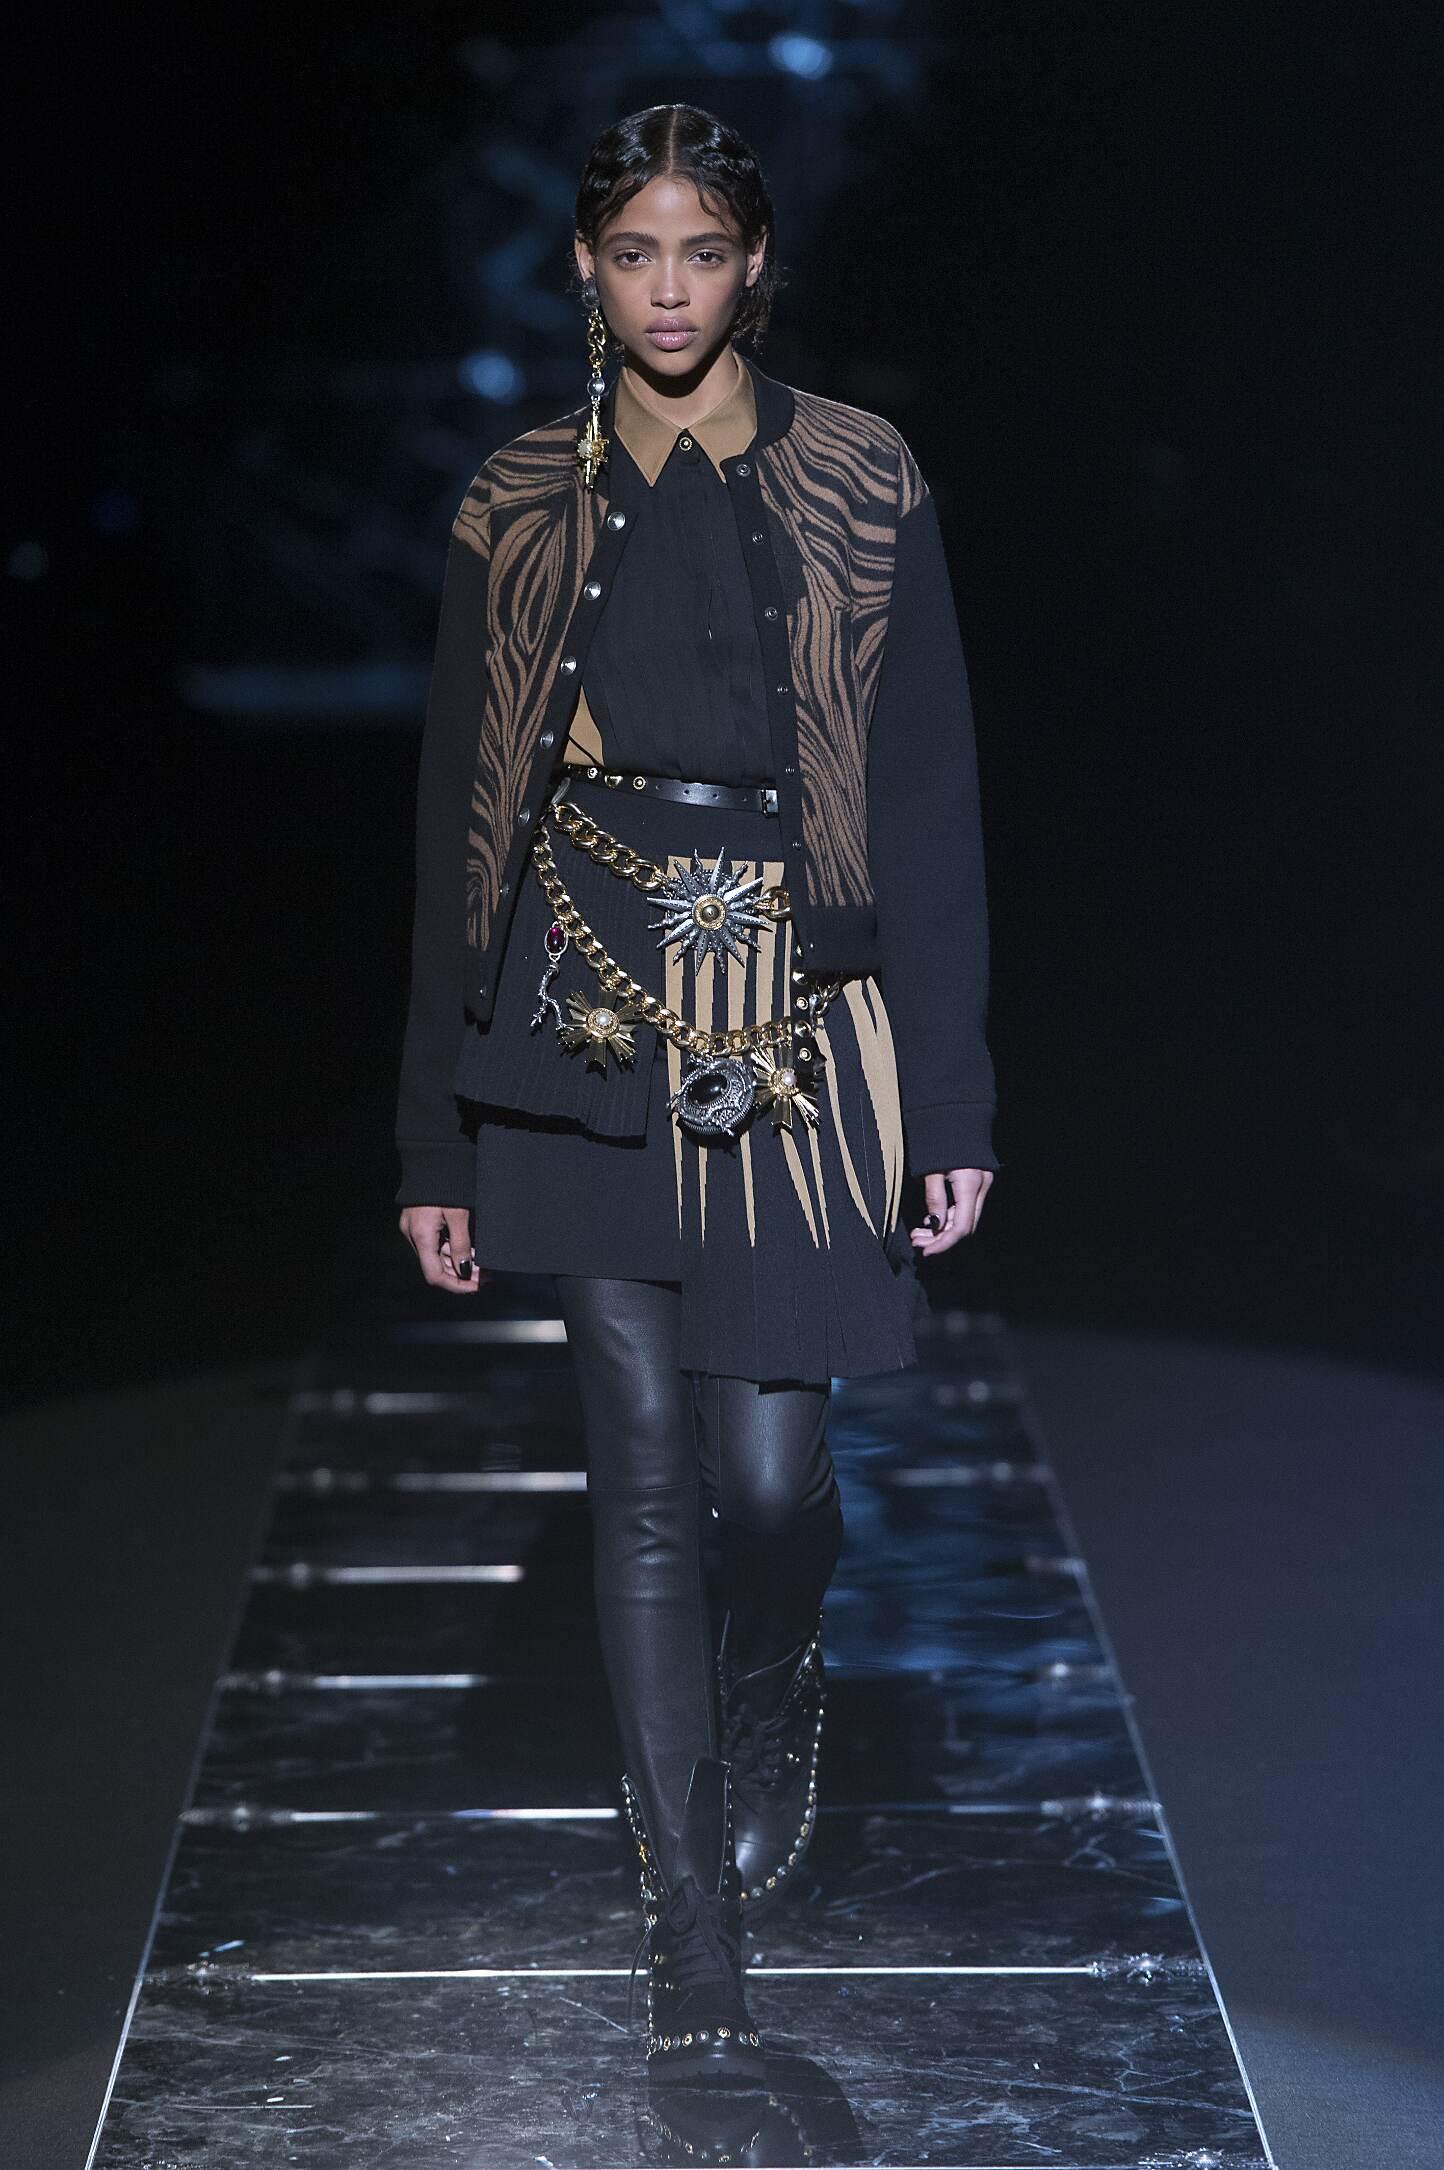 Catwalk Fausto Puglisi Collection Fashion Show Winter 2015